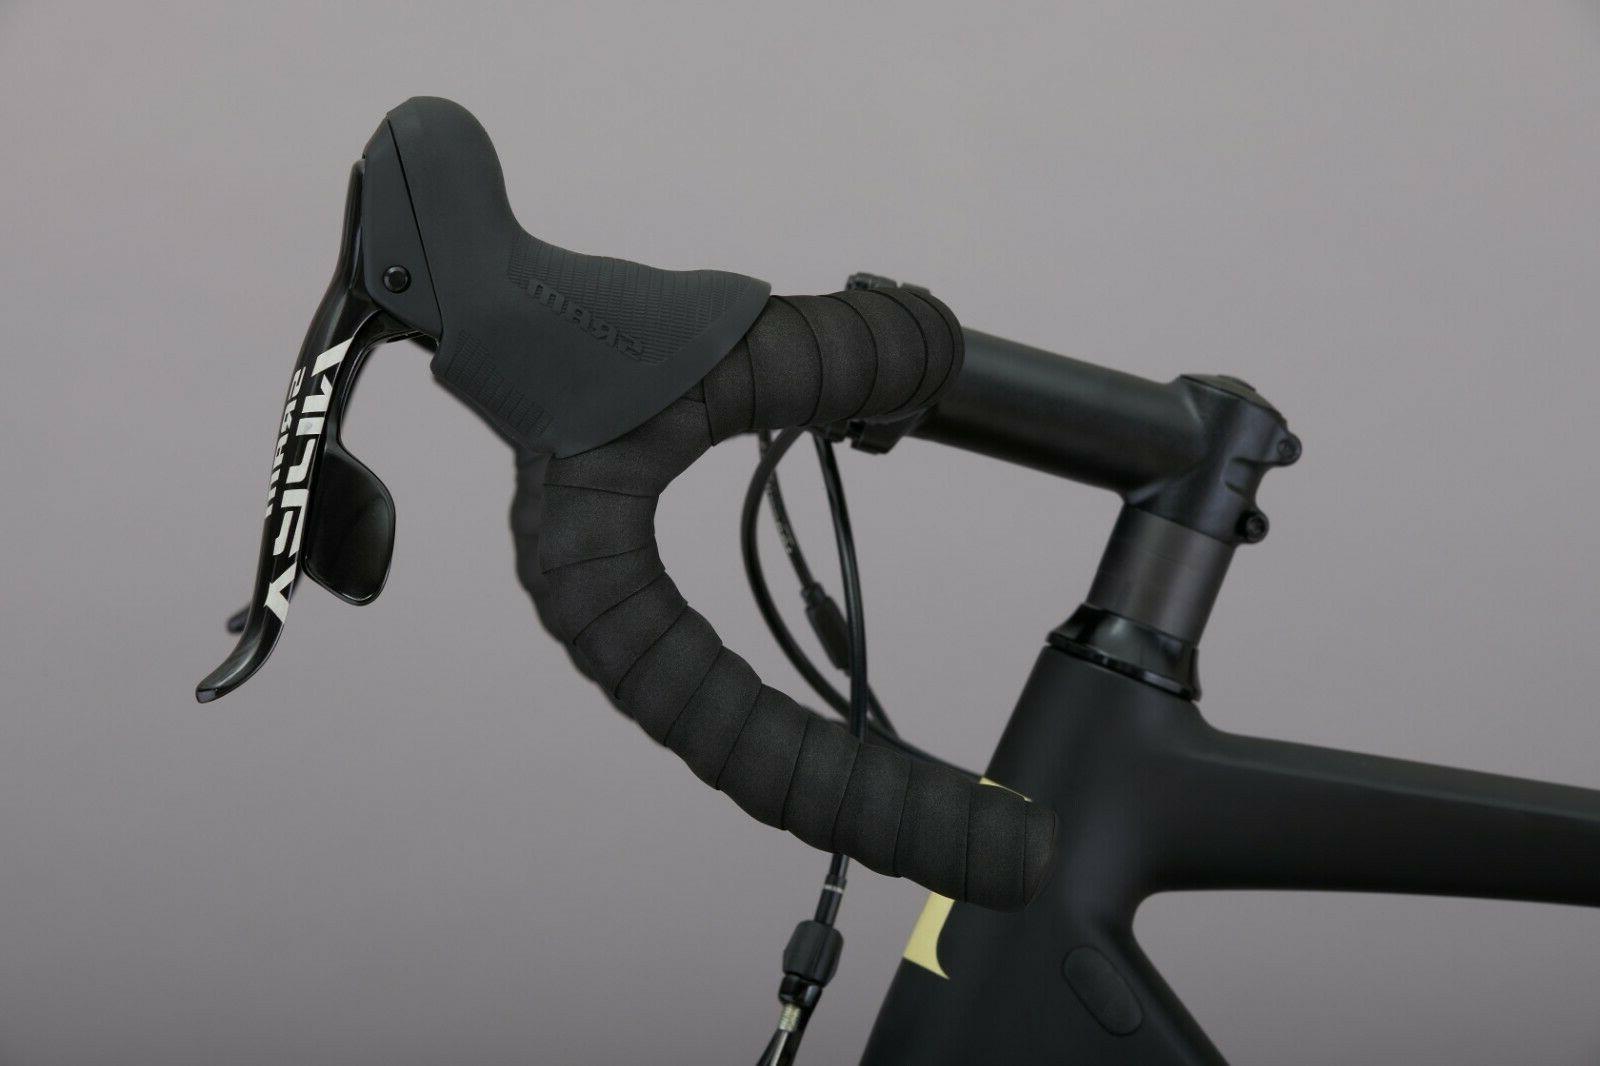 Dragon Bicycles SRAM 1 Aero Light Fiber Bike Small, Black